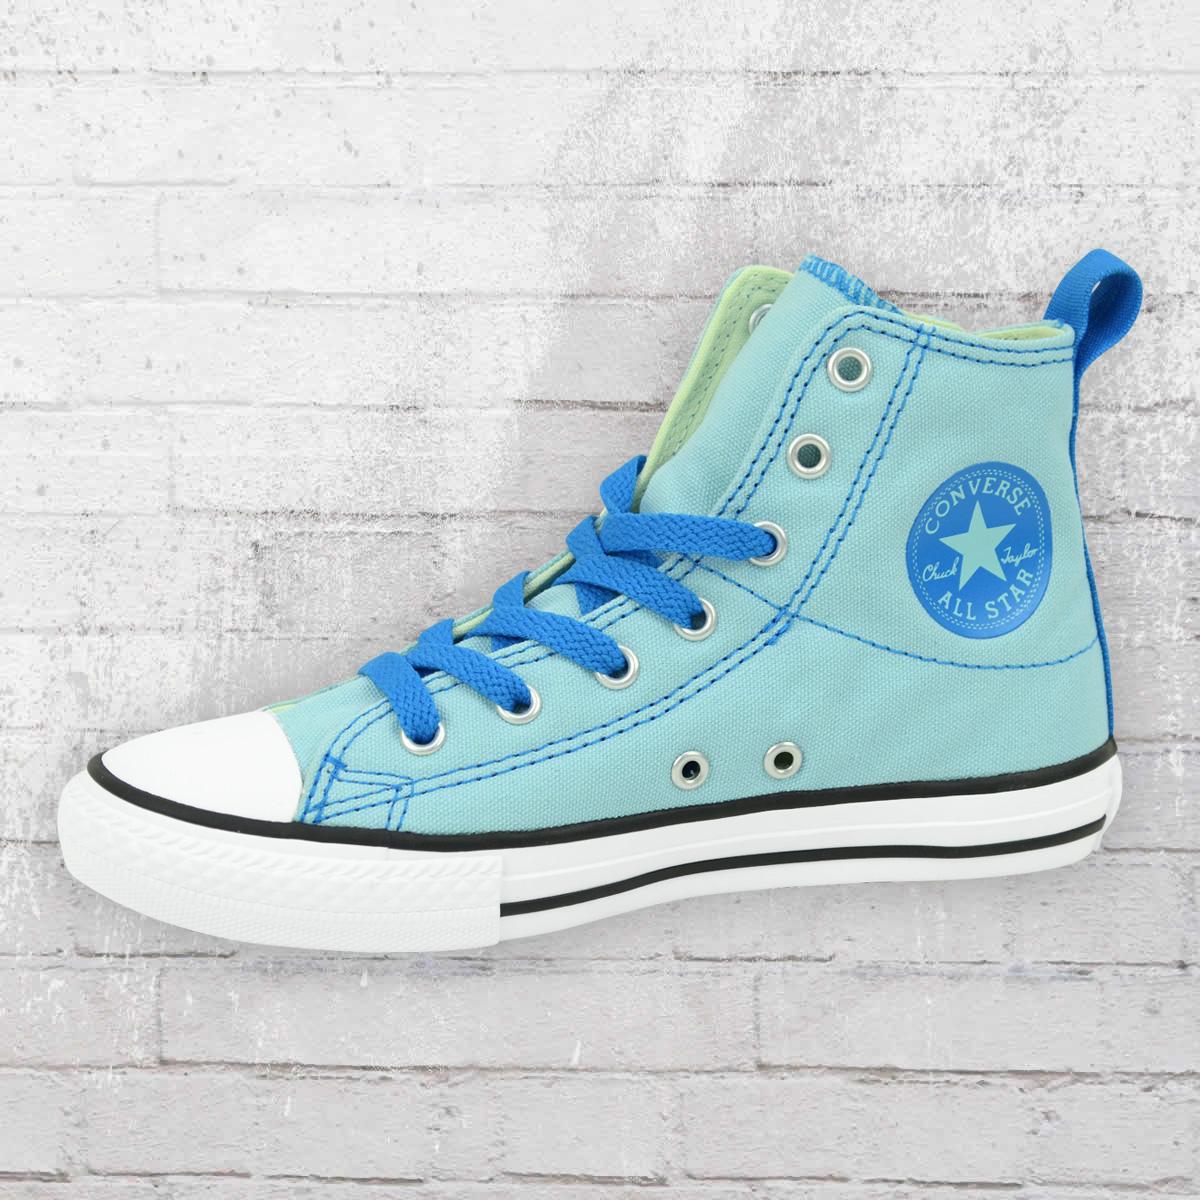 order now converse kids chucks shoes 651758c simple slip. Black Bedroom Furniture Sets. Home Design Ideas